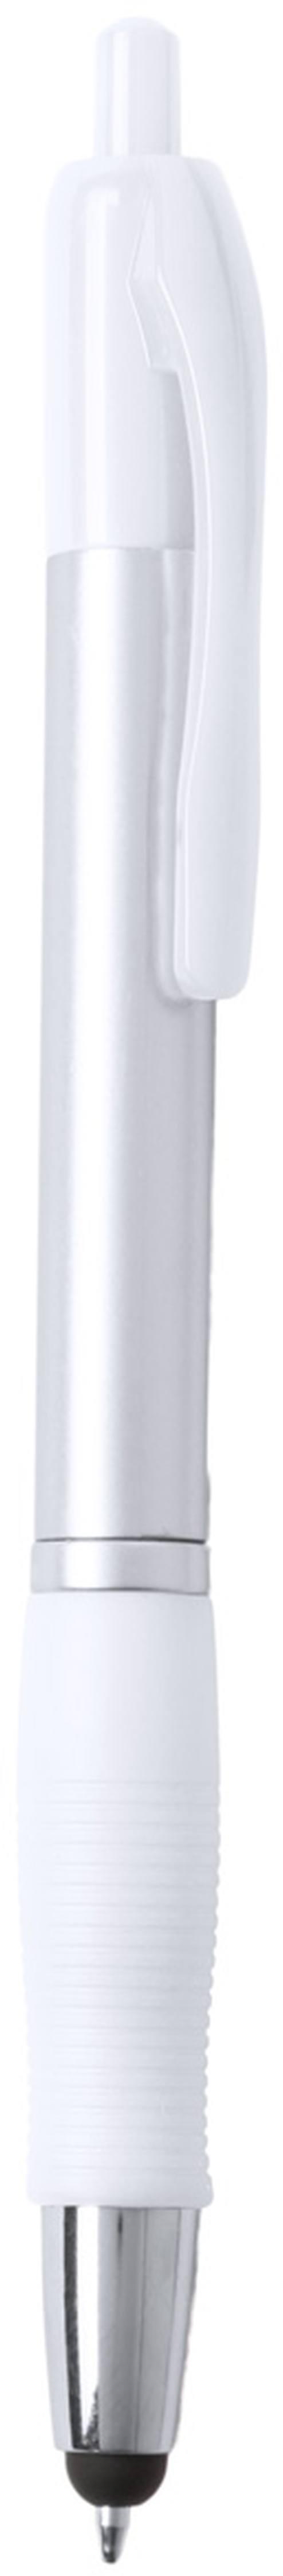 Clurk dotykové kuličkové pero